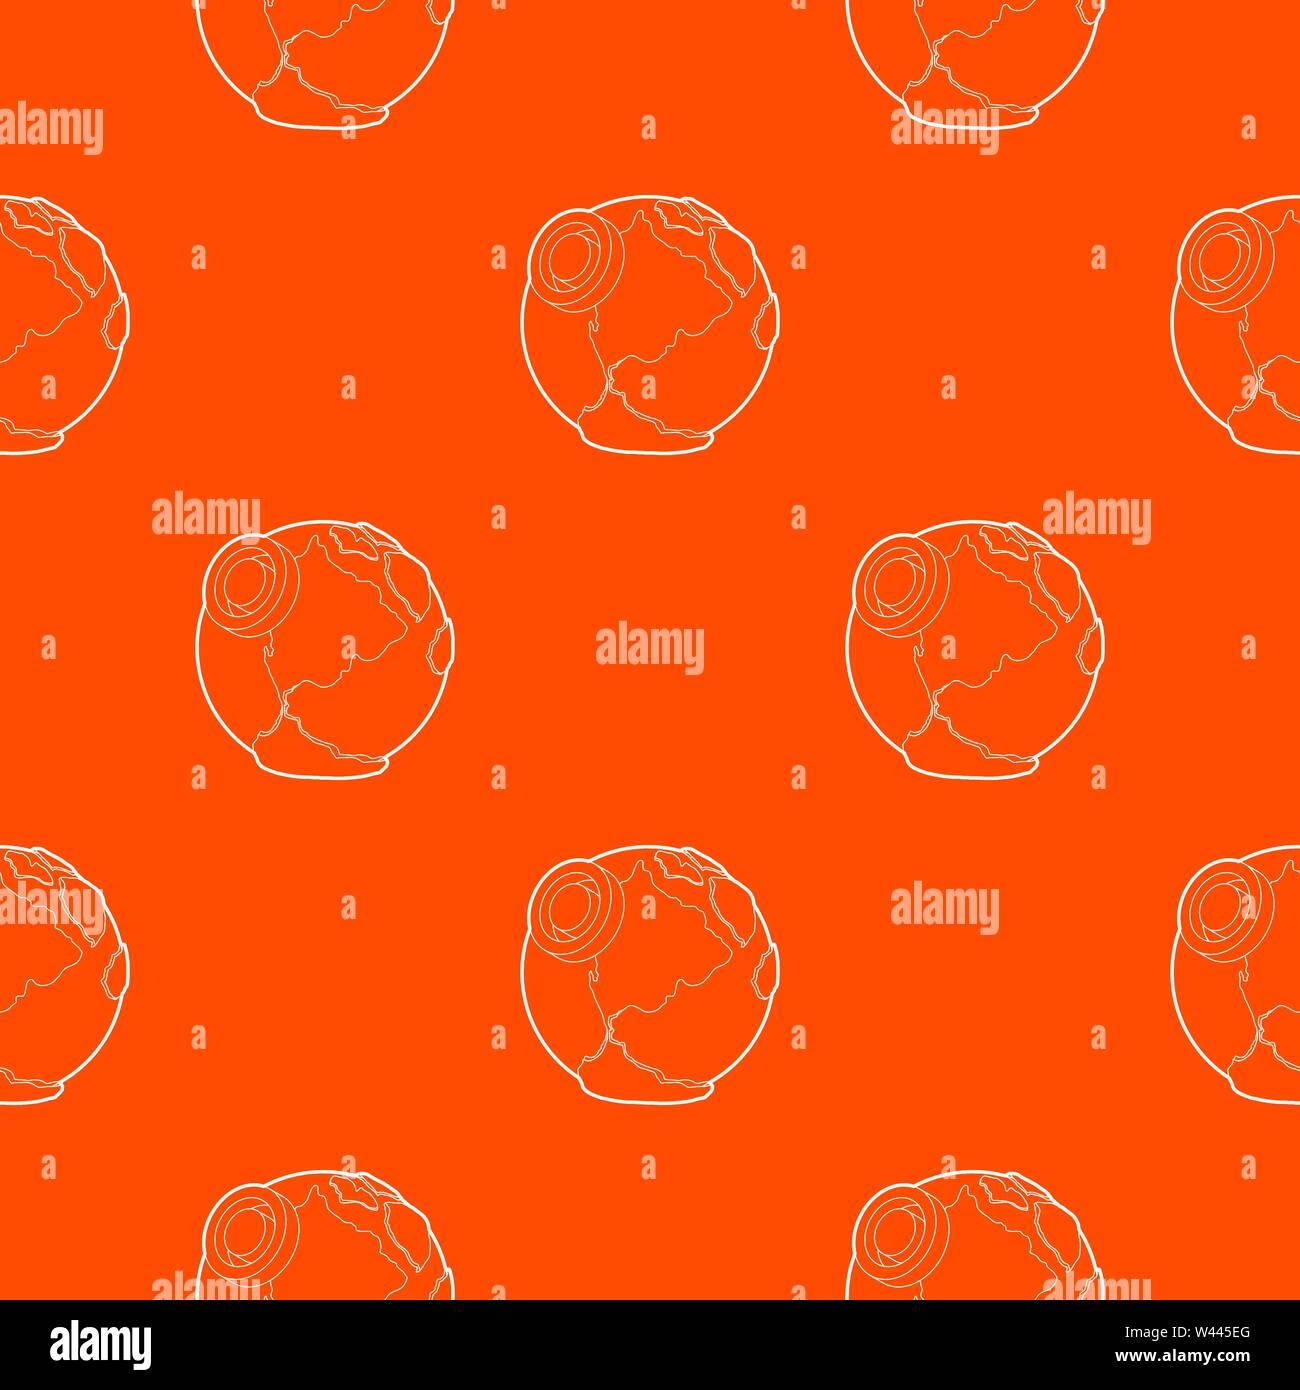 Earth pattern vector orange - Stock Vector